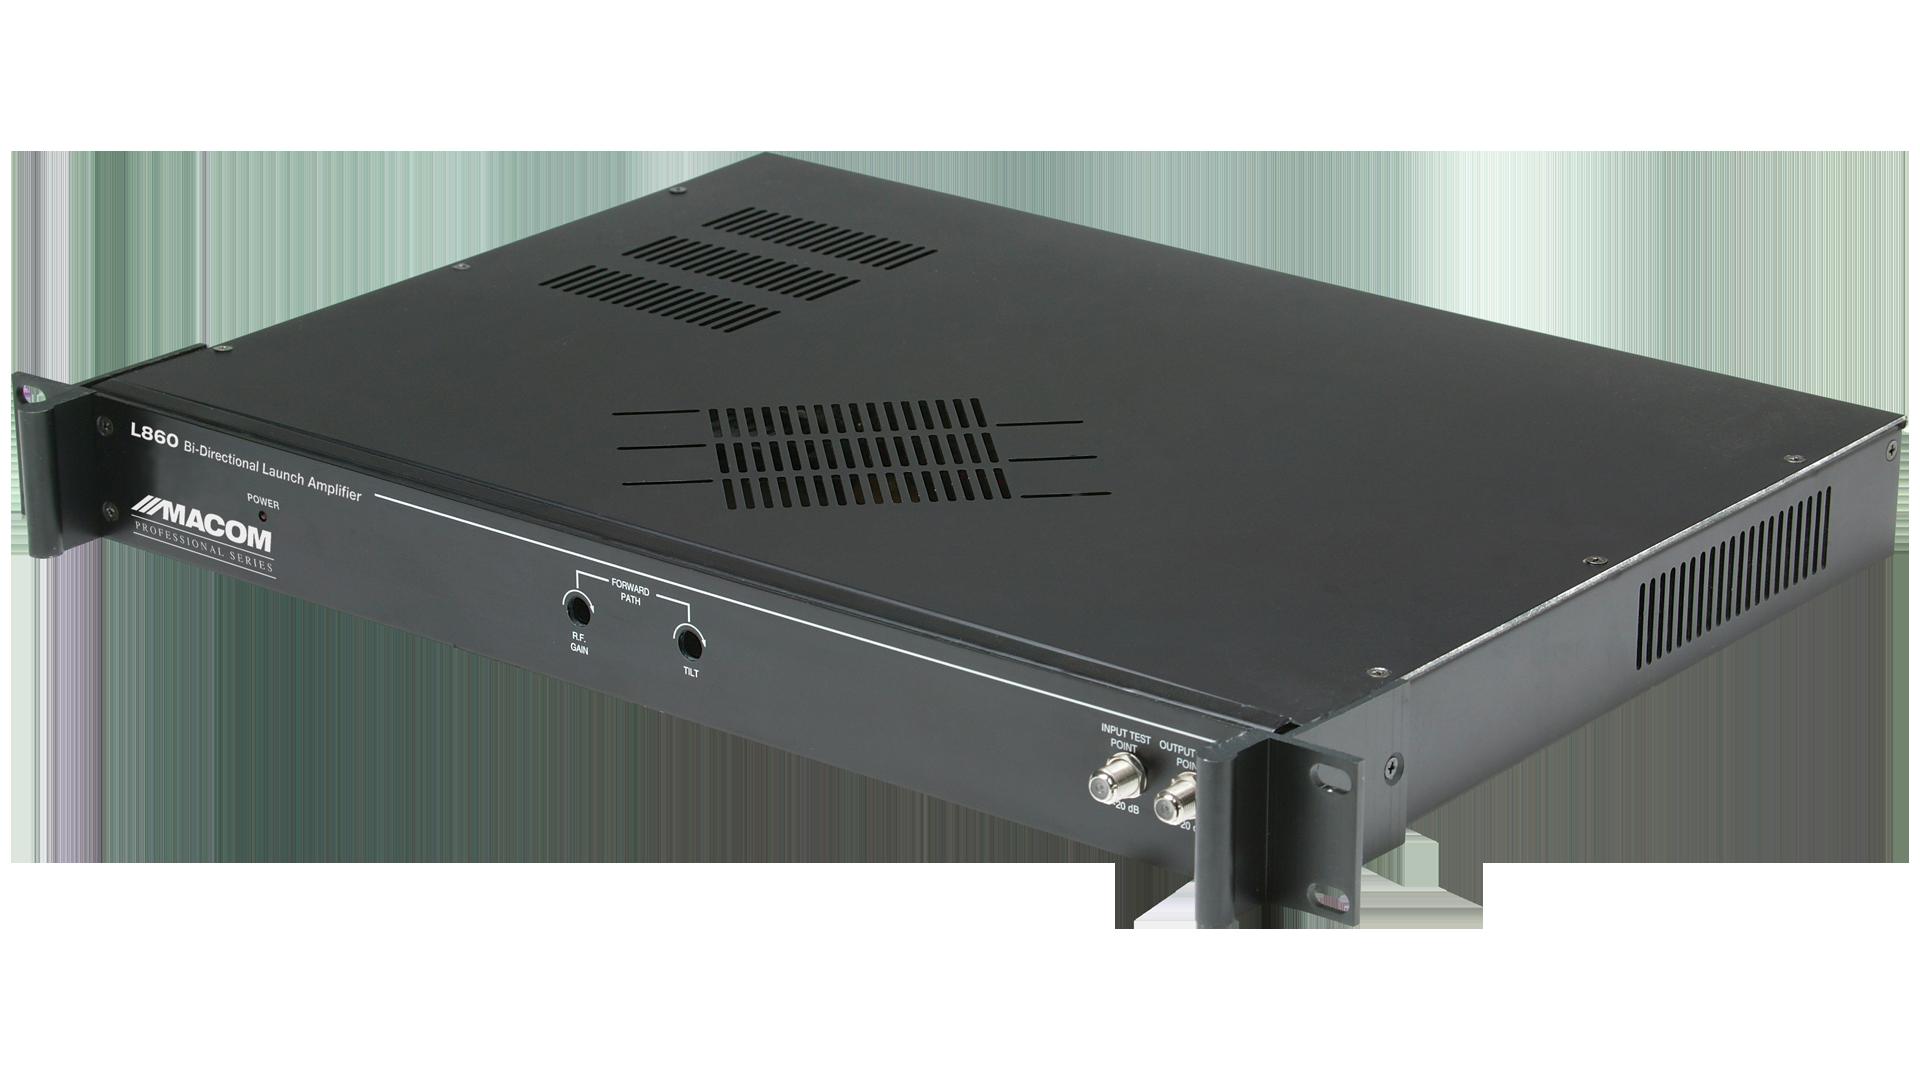 L860: Bi-Directional Launch Amplifier